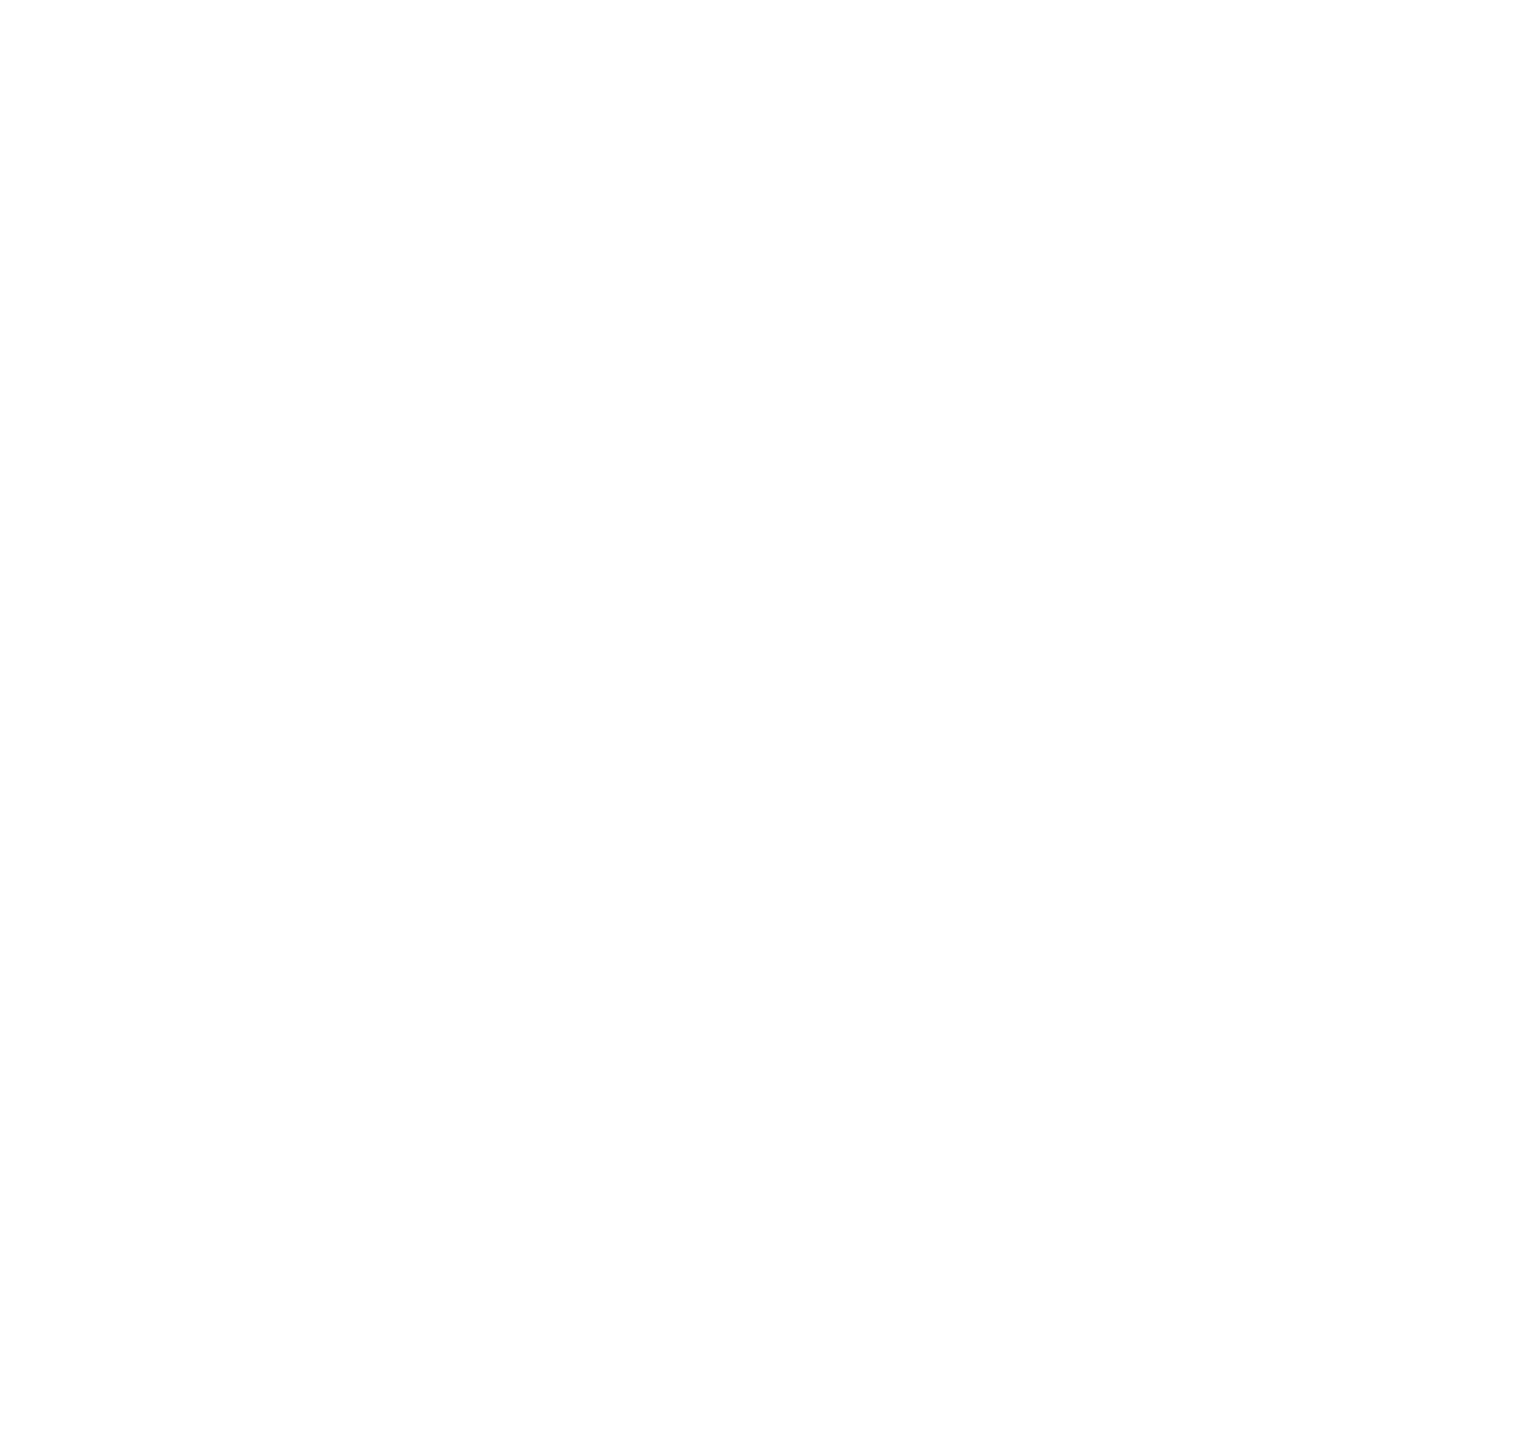 combifit-midi-cf8_1000ml_napj-owsiany_struktura-signia